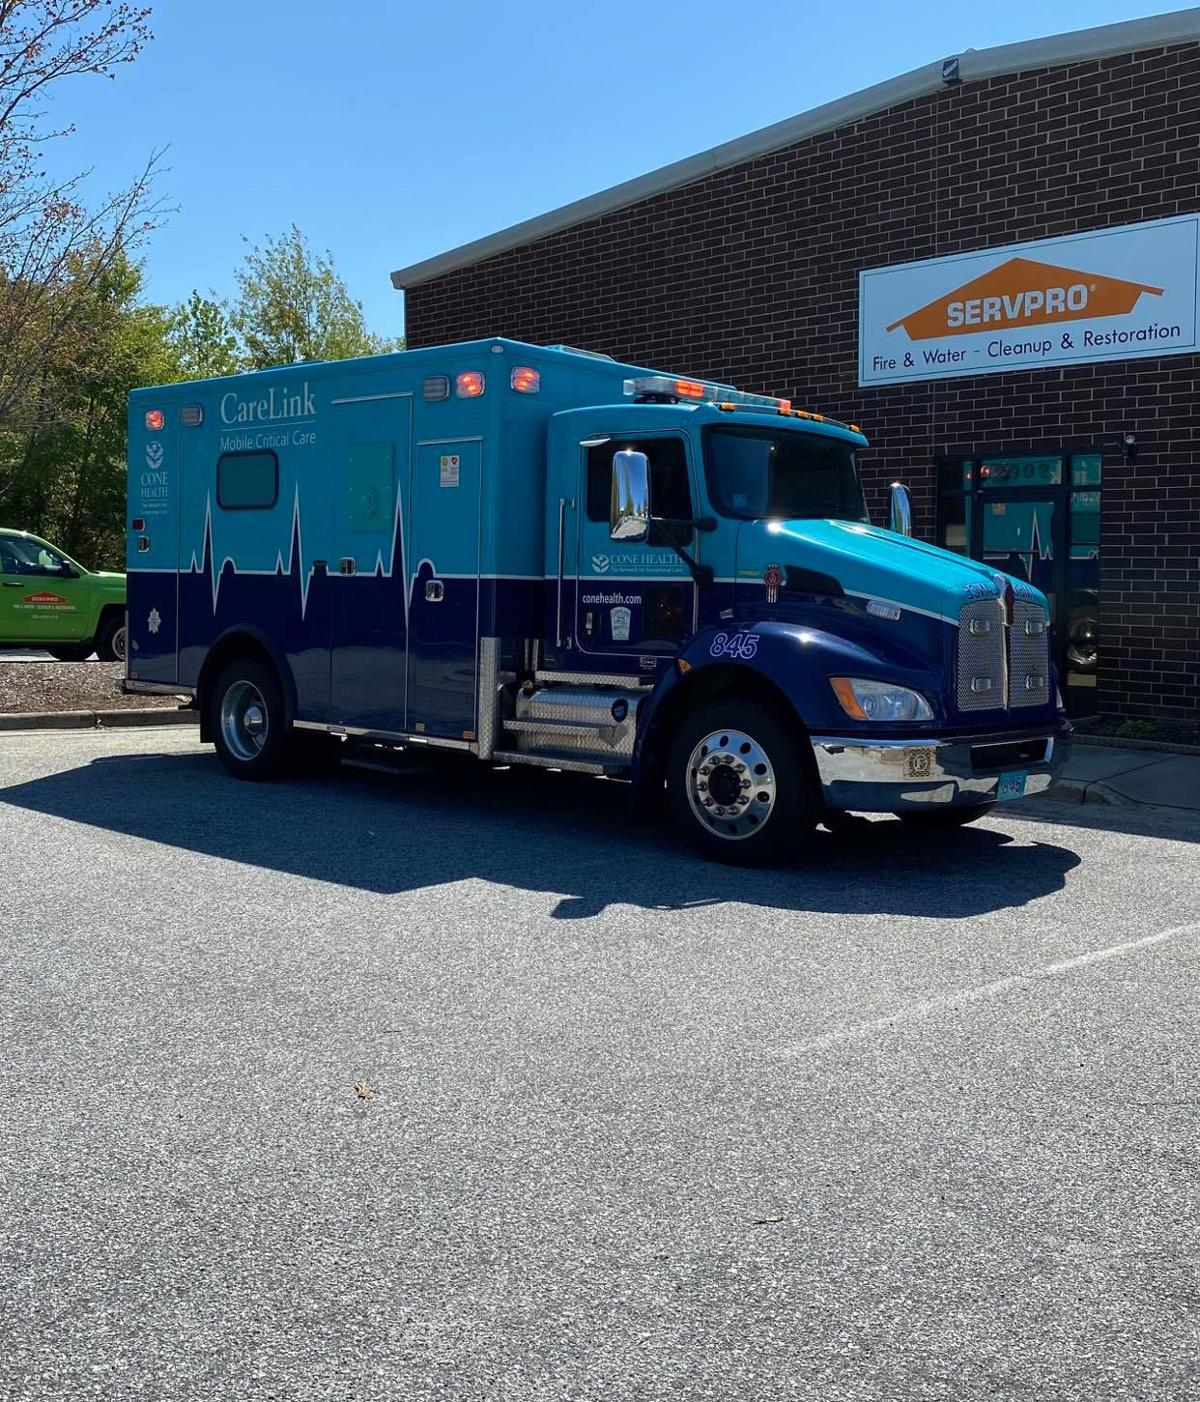 SERVPRO Truck, Logo & Cone Health Ambulence.jpg